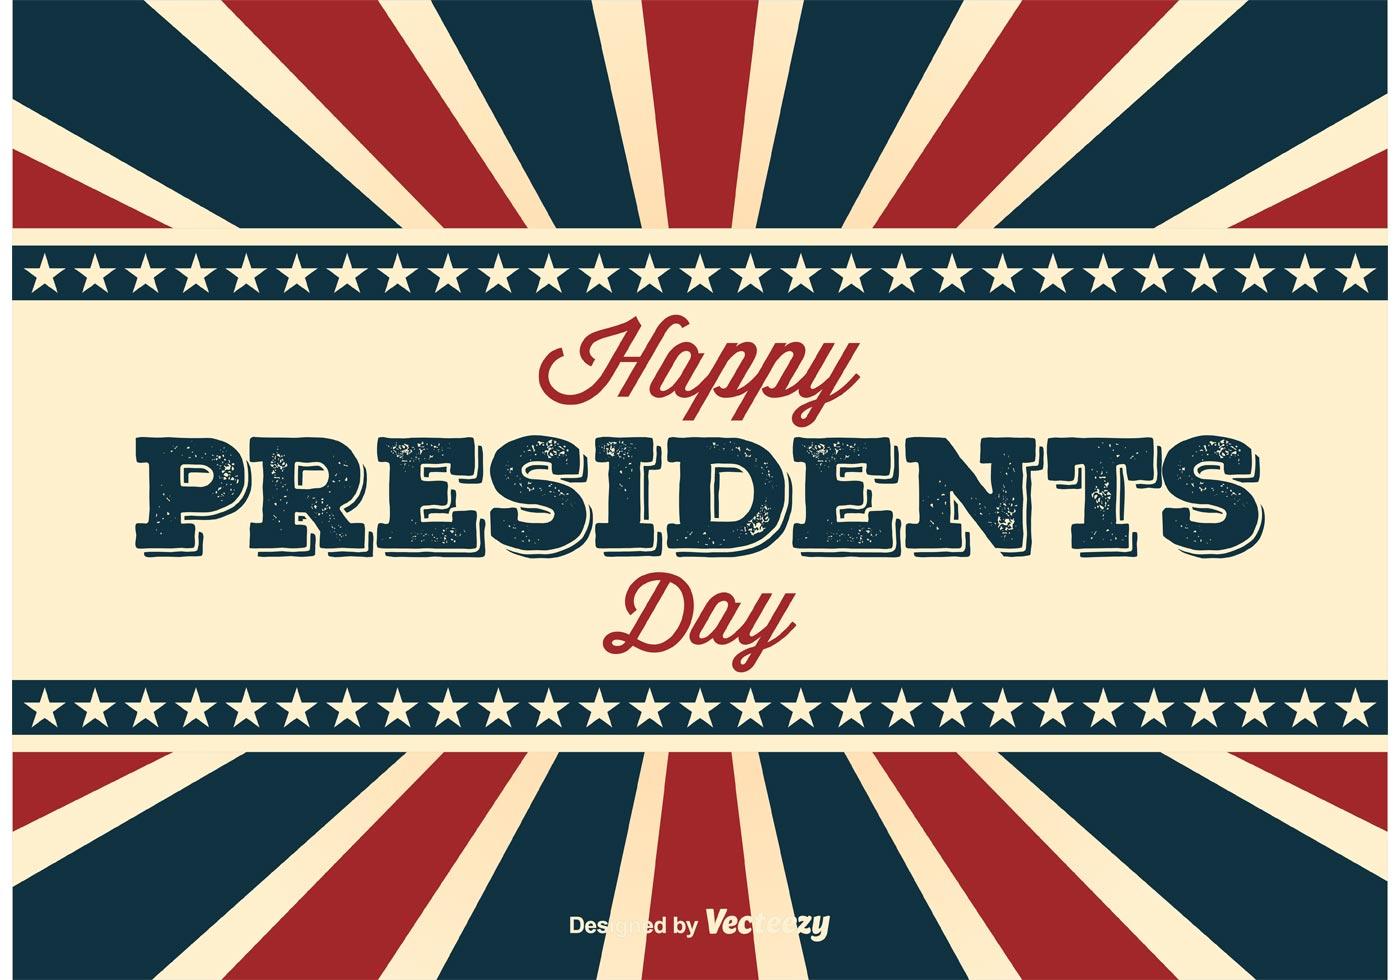 Retro Presidents Day Poster